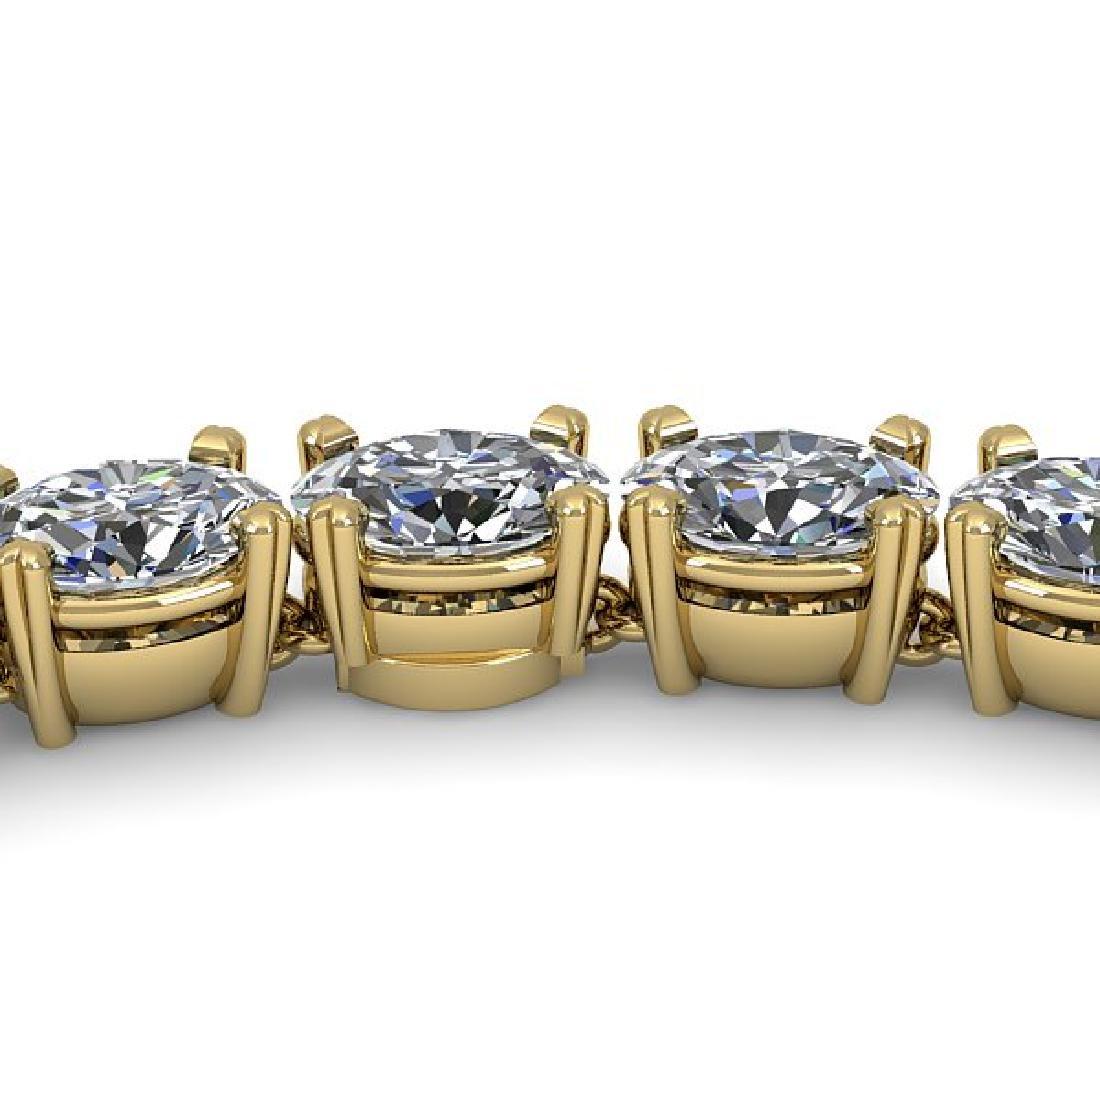 35 CTW Oval Cut Certified SI Diamond Necklace 14K